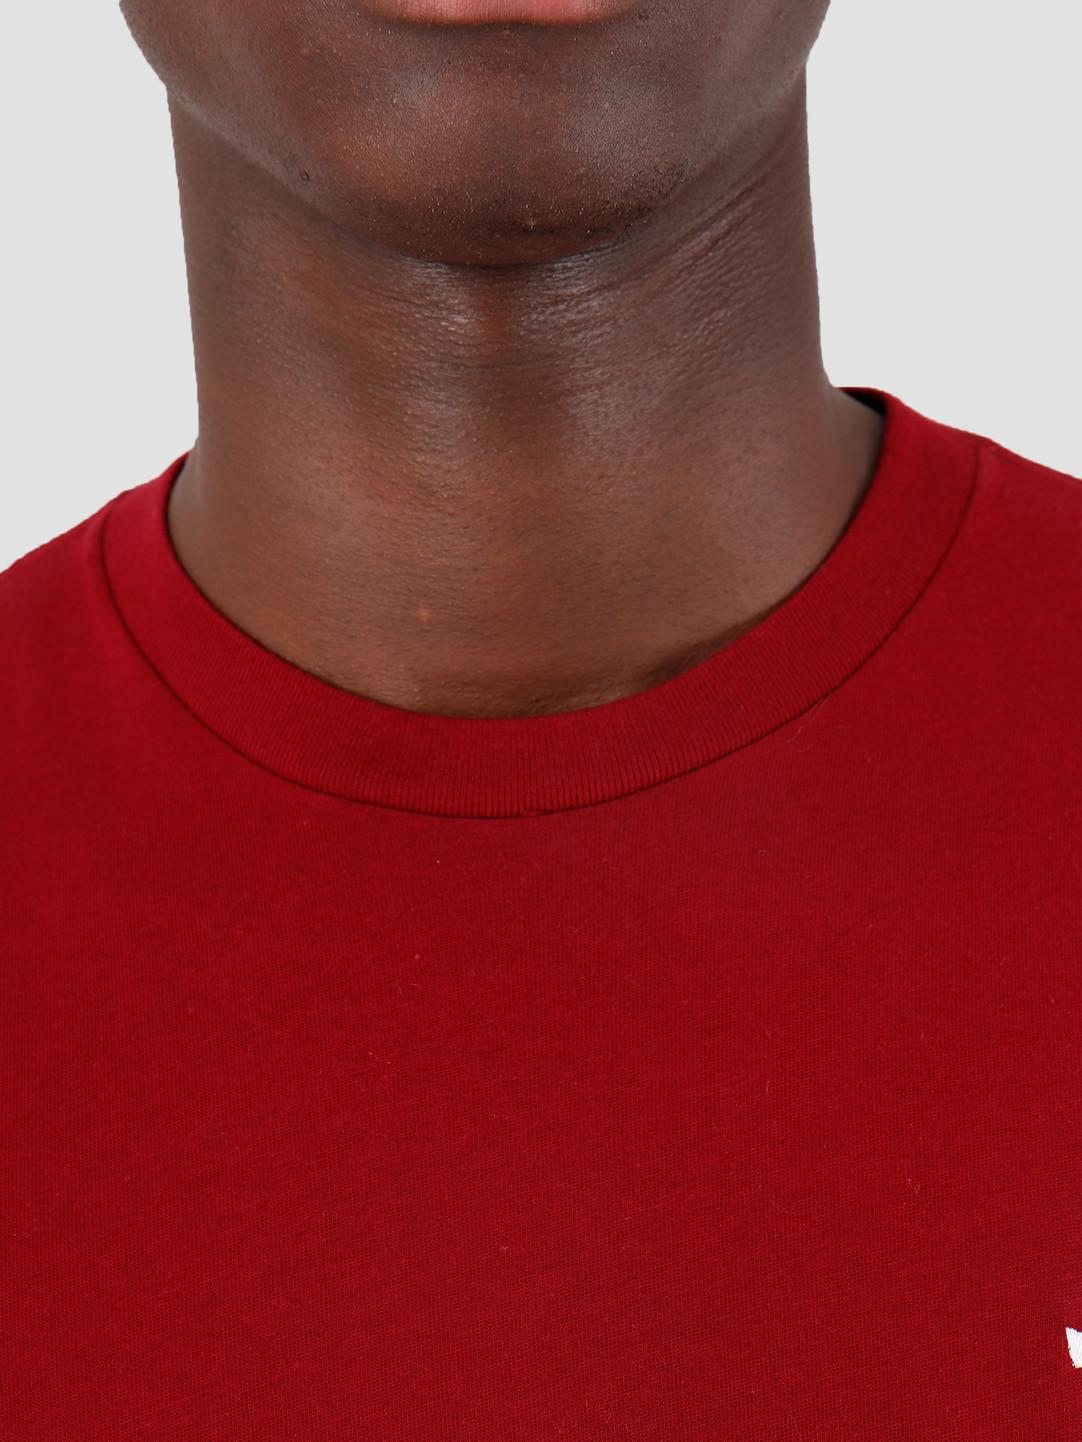 adidas adidas Essential T-Shirt Cburgu Collegiate Burgundy FQ3341